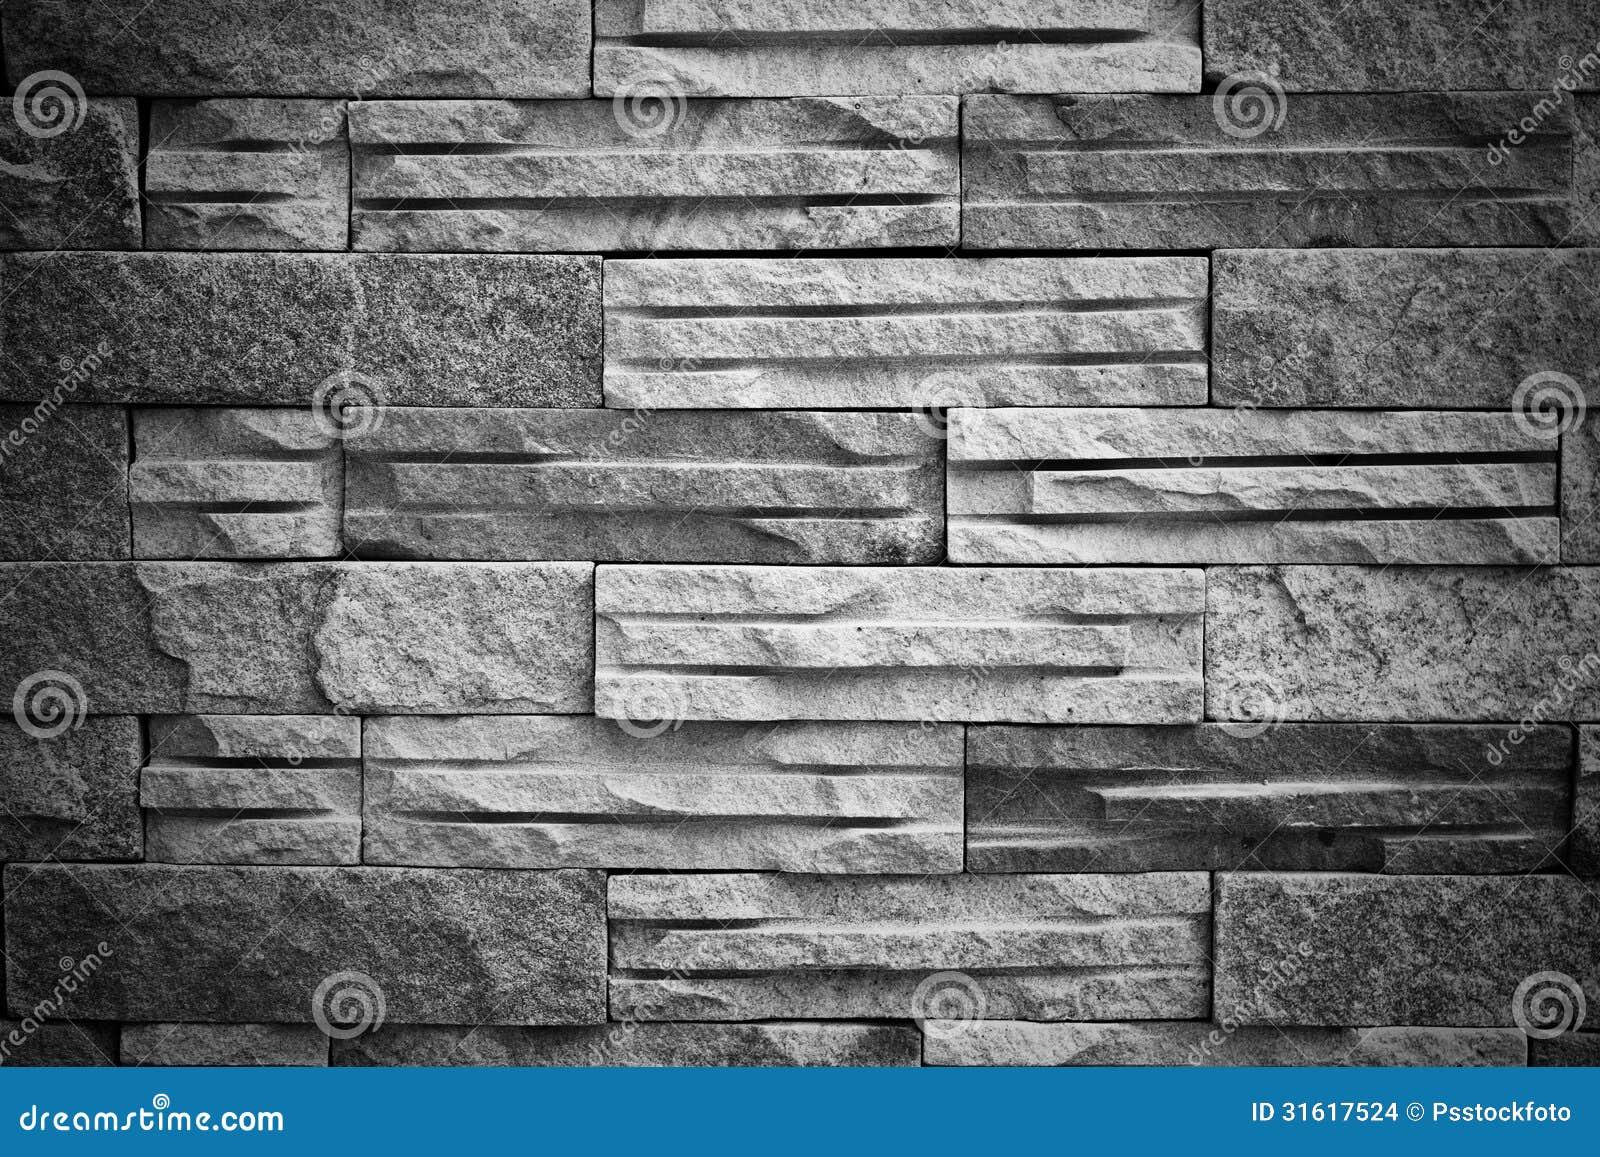 Black White Brick Block Texture Stock Photo